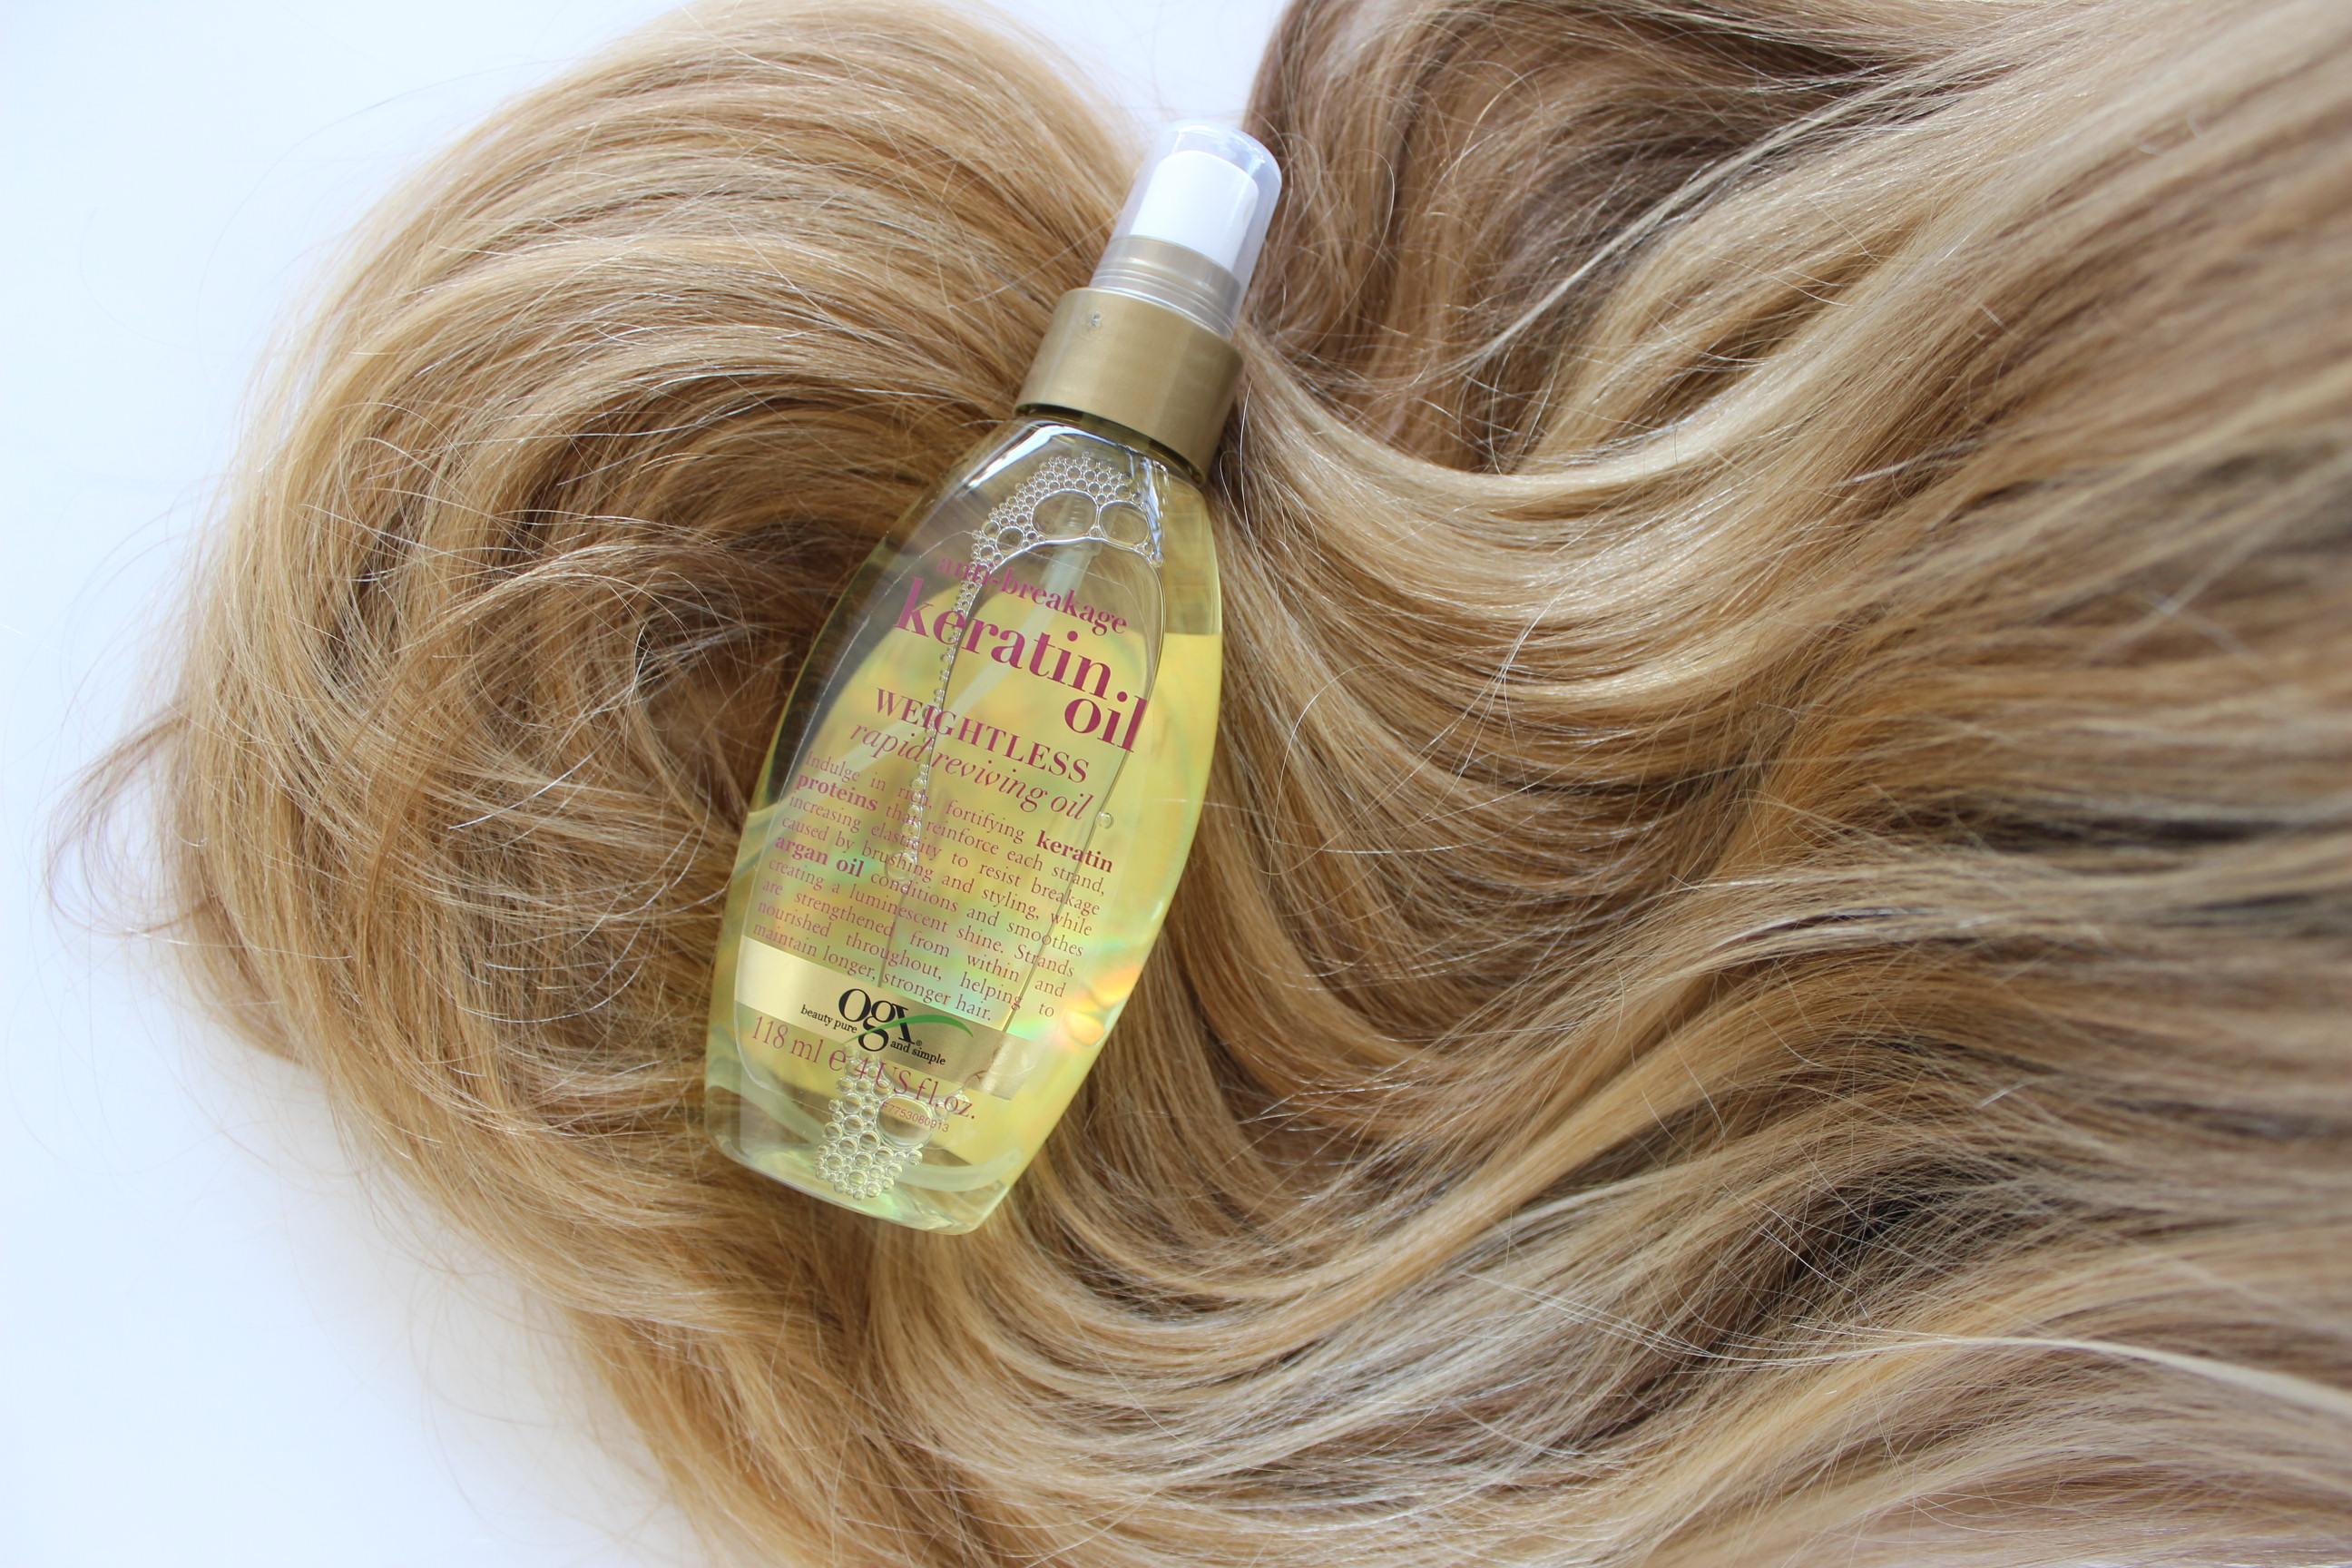 Jenni testet #1: Organix Macadamia Oil Shampoo + Conditioner Haarpflege mit Pepper And Gold